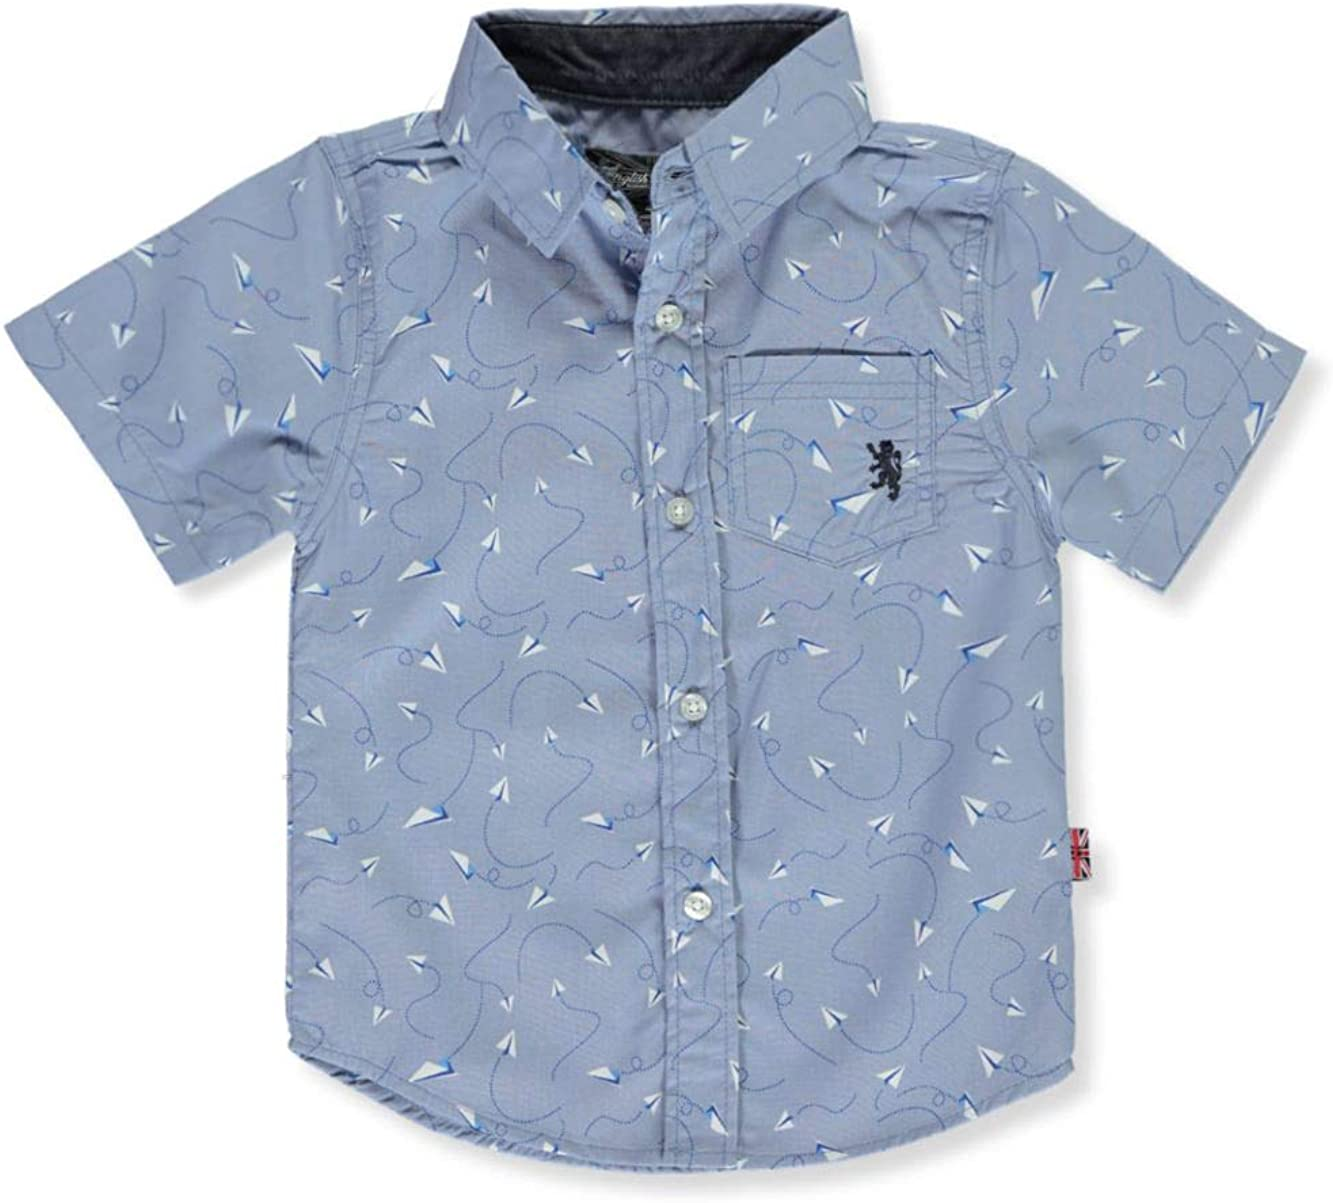 English Laundry Boys' Classic Short Sleeve Woven Shirt